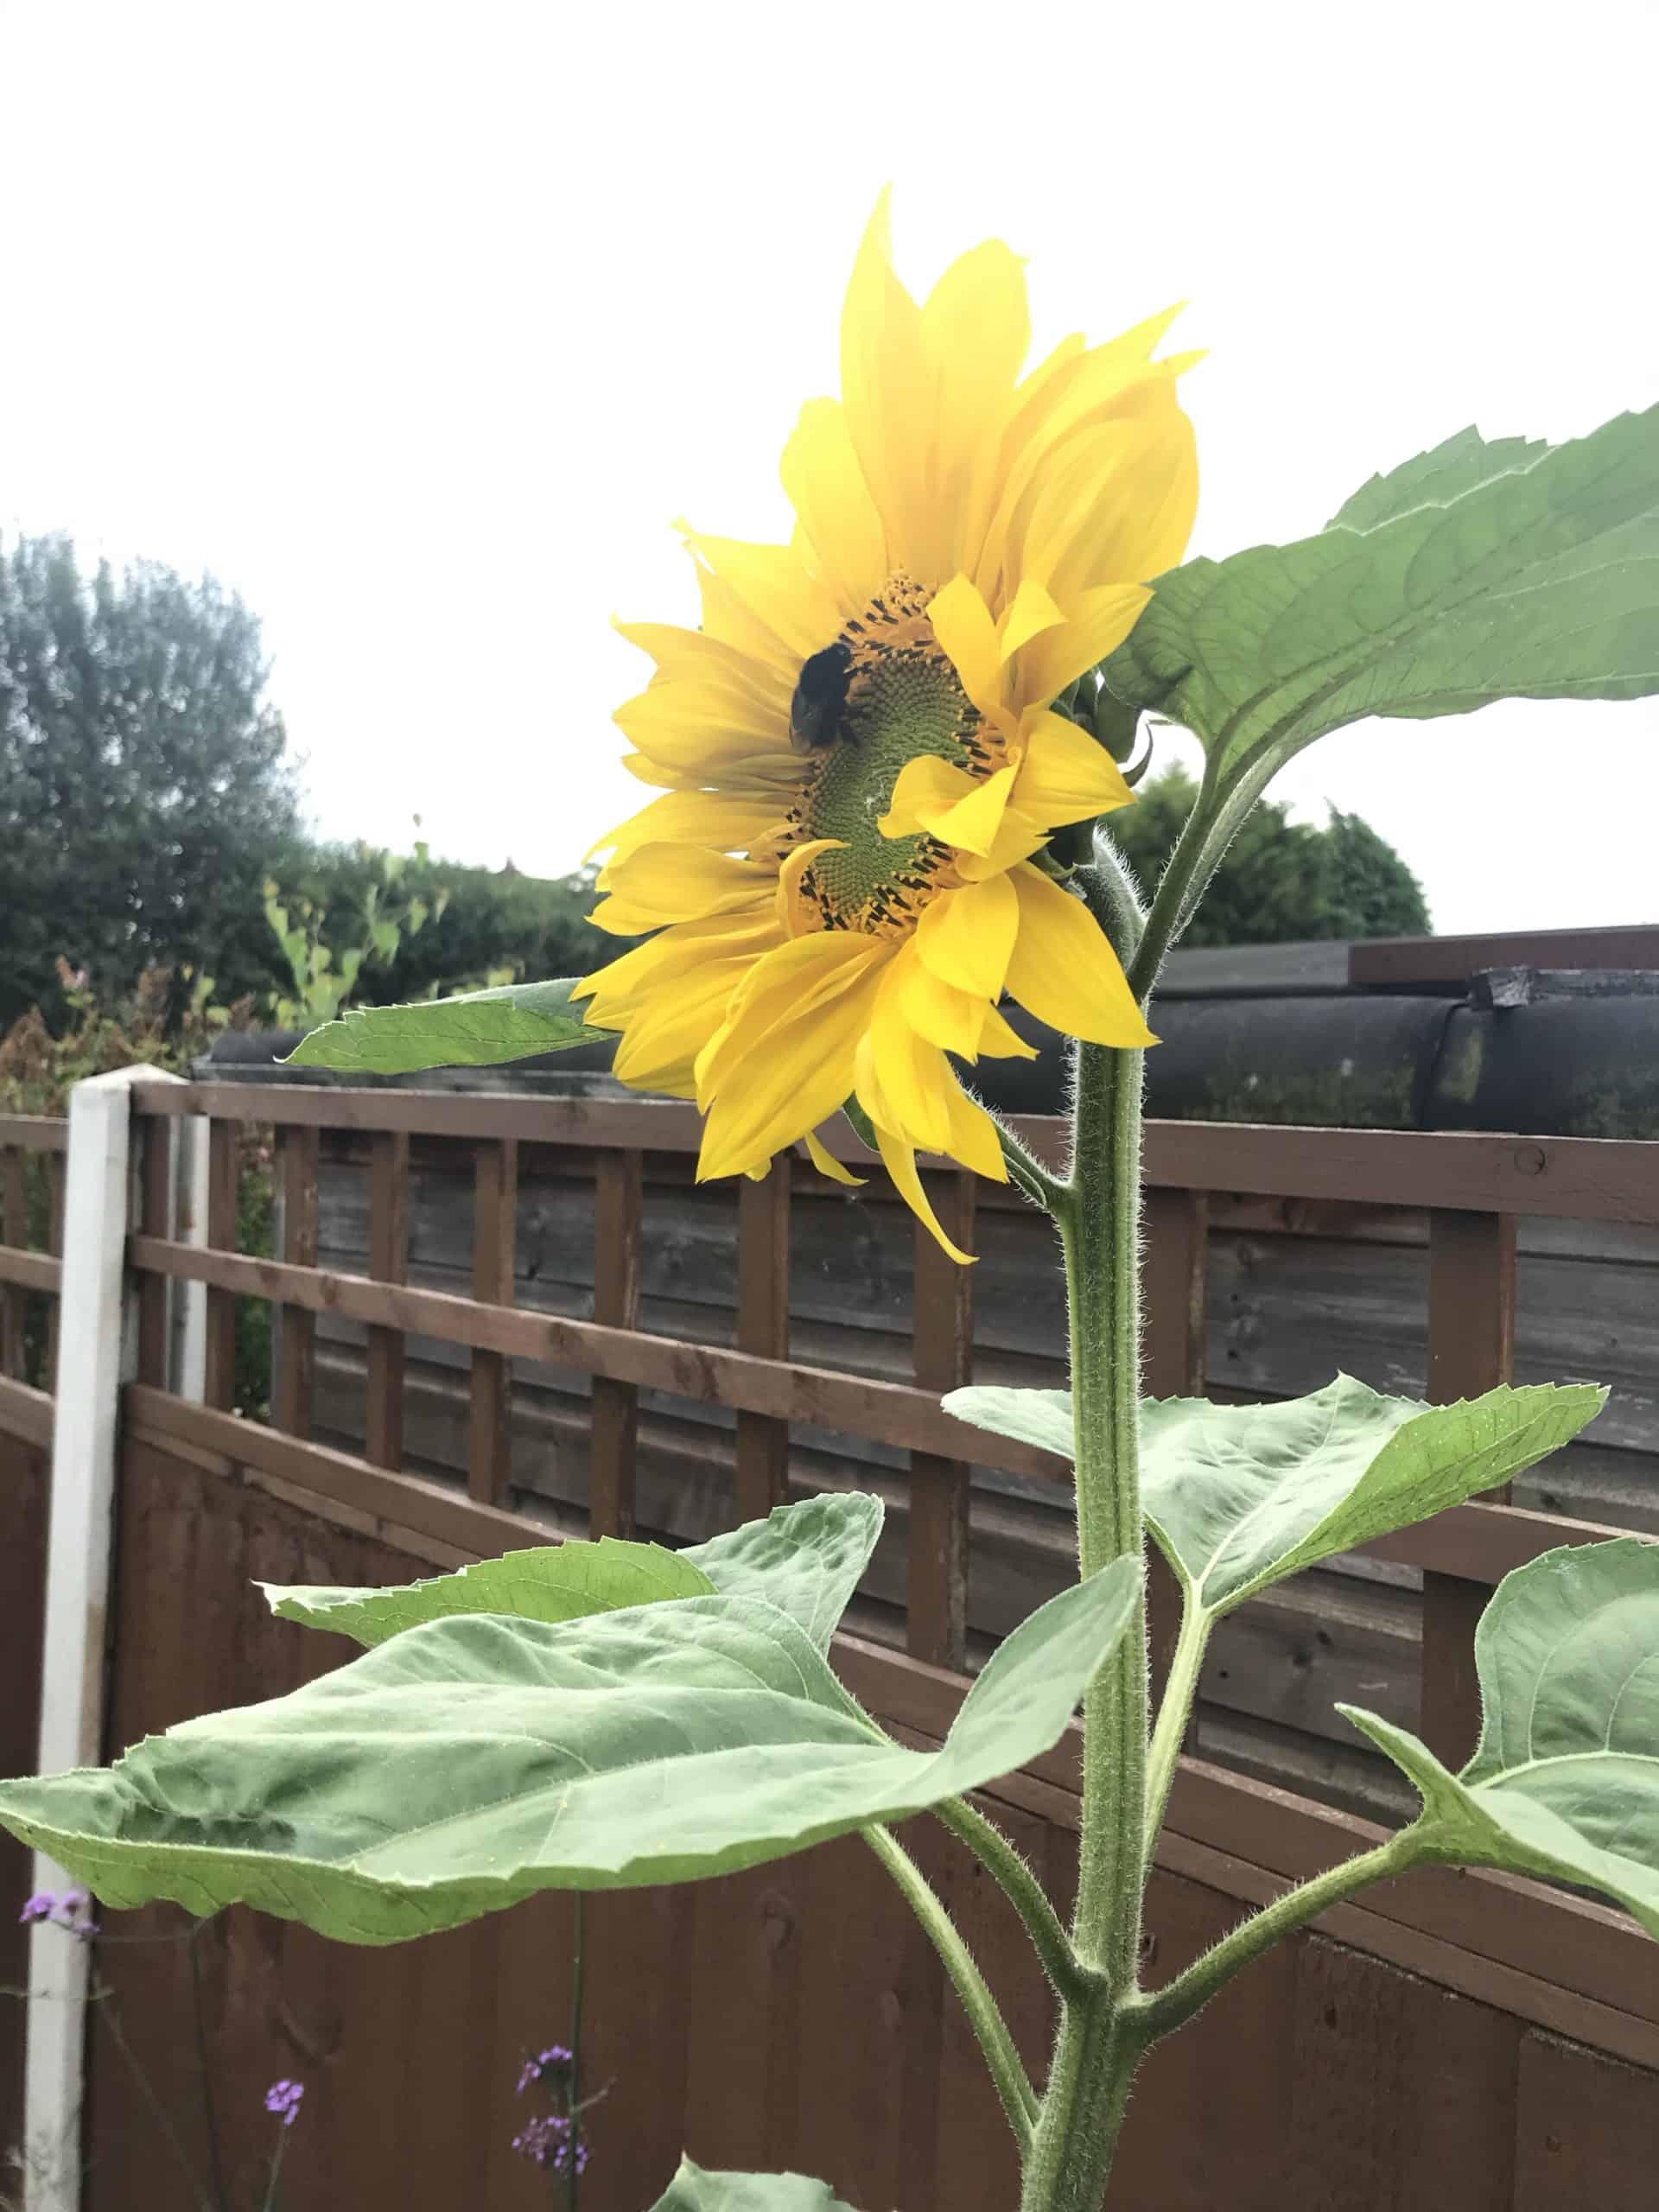 Getting the garden summer ready